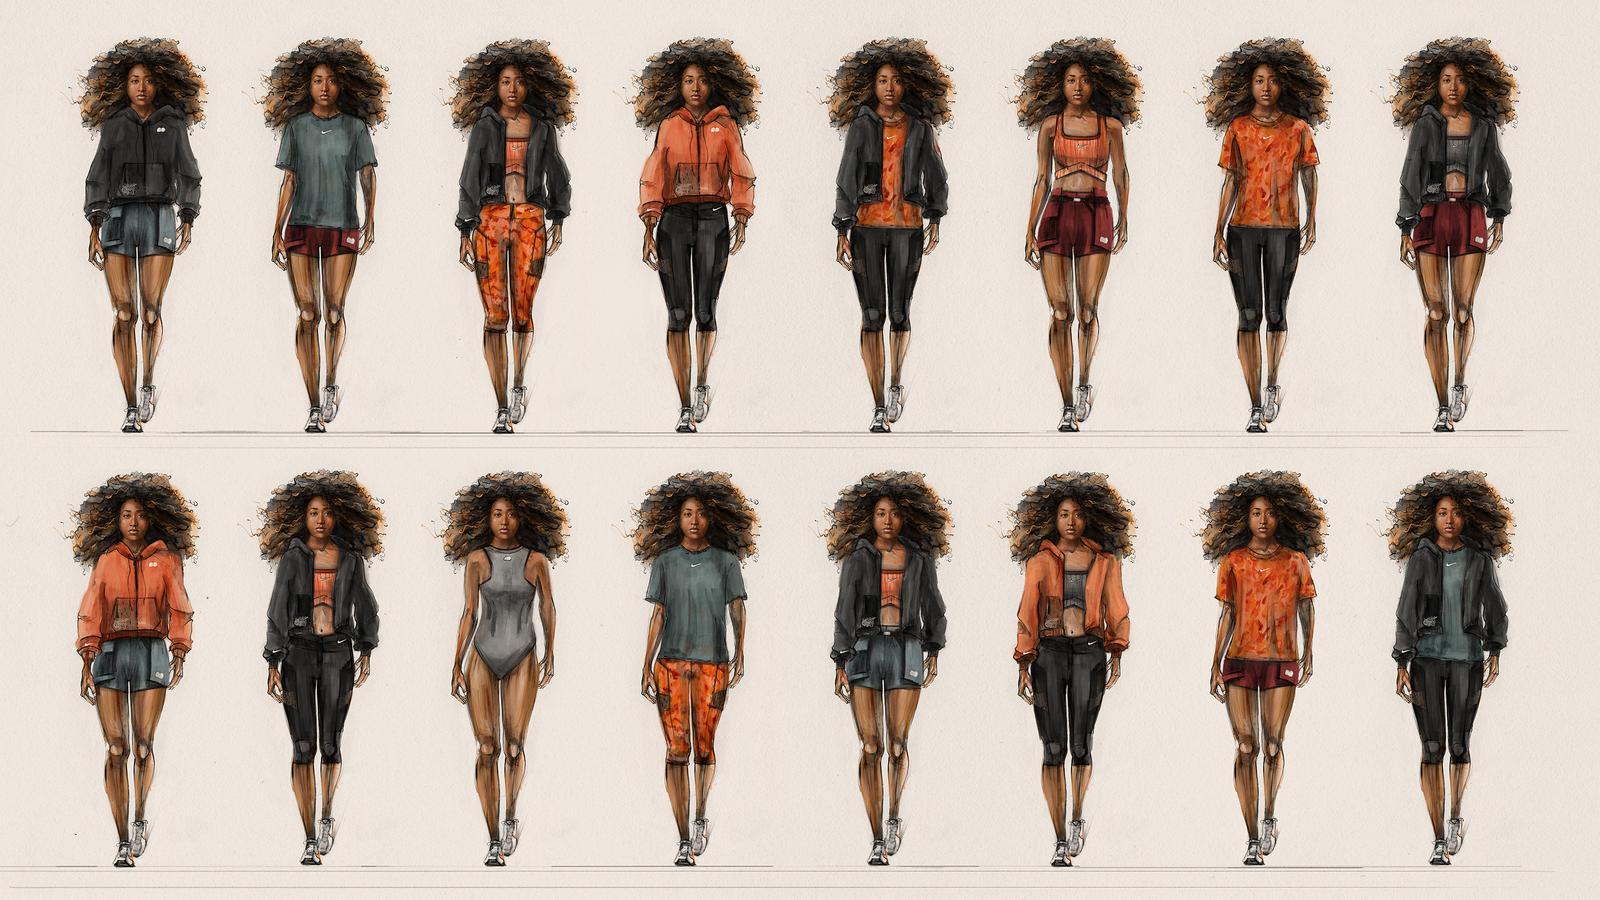 Nike x Naomi Osaka second apparel collection